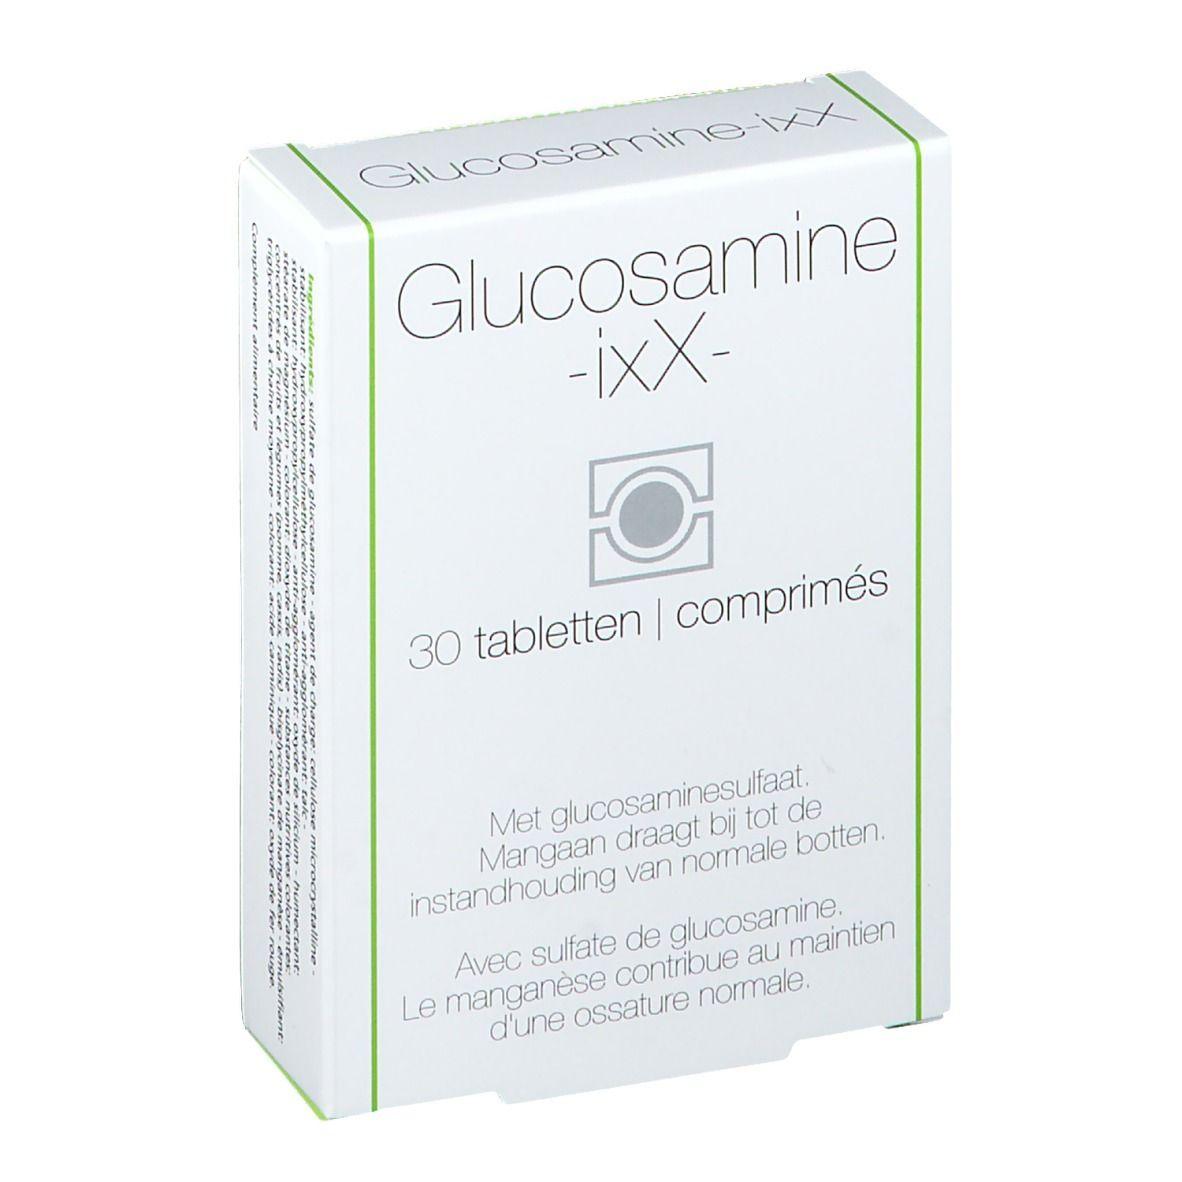 ixX Glucosamine-ixX pc(s) comprimé(s)